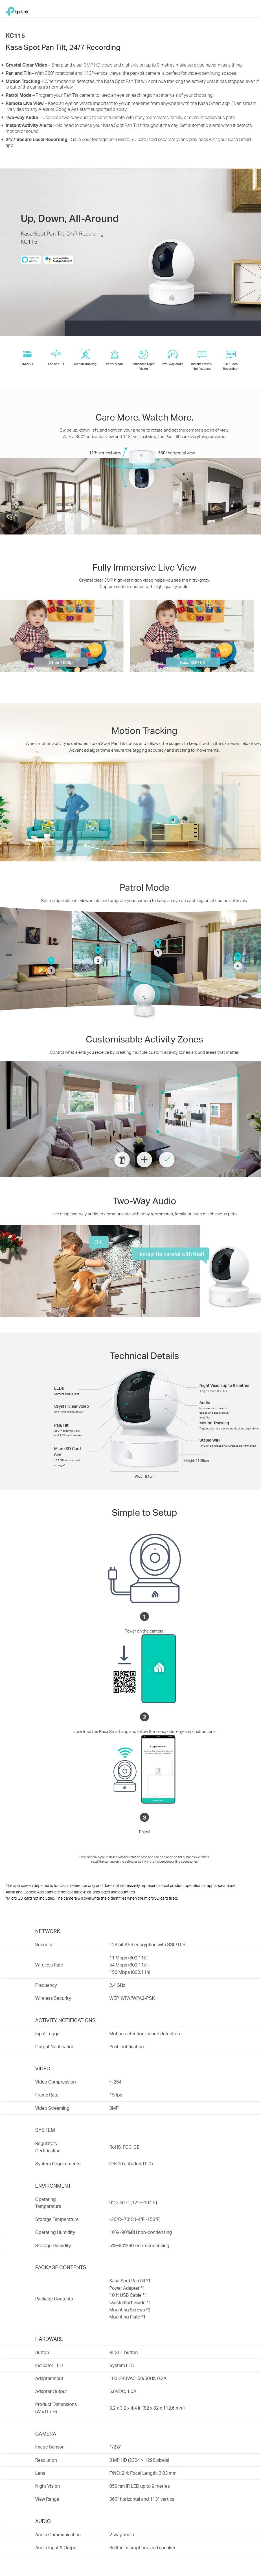 TP-Link KC115 Kasa Spot Pan Tilt 24/7 Recording Indoor Camera - Desktop Overview 1